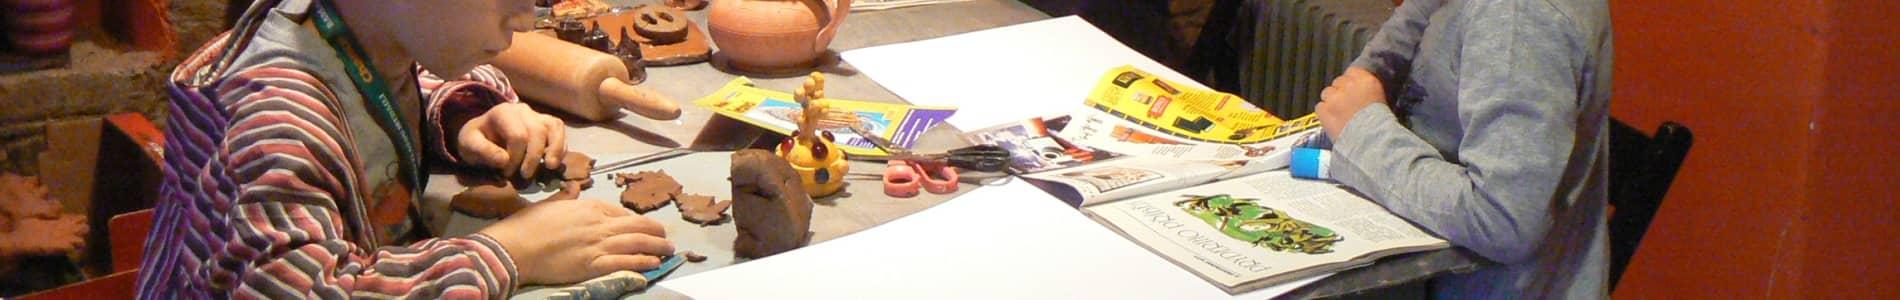 kresba, malba keramika děti